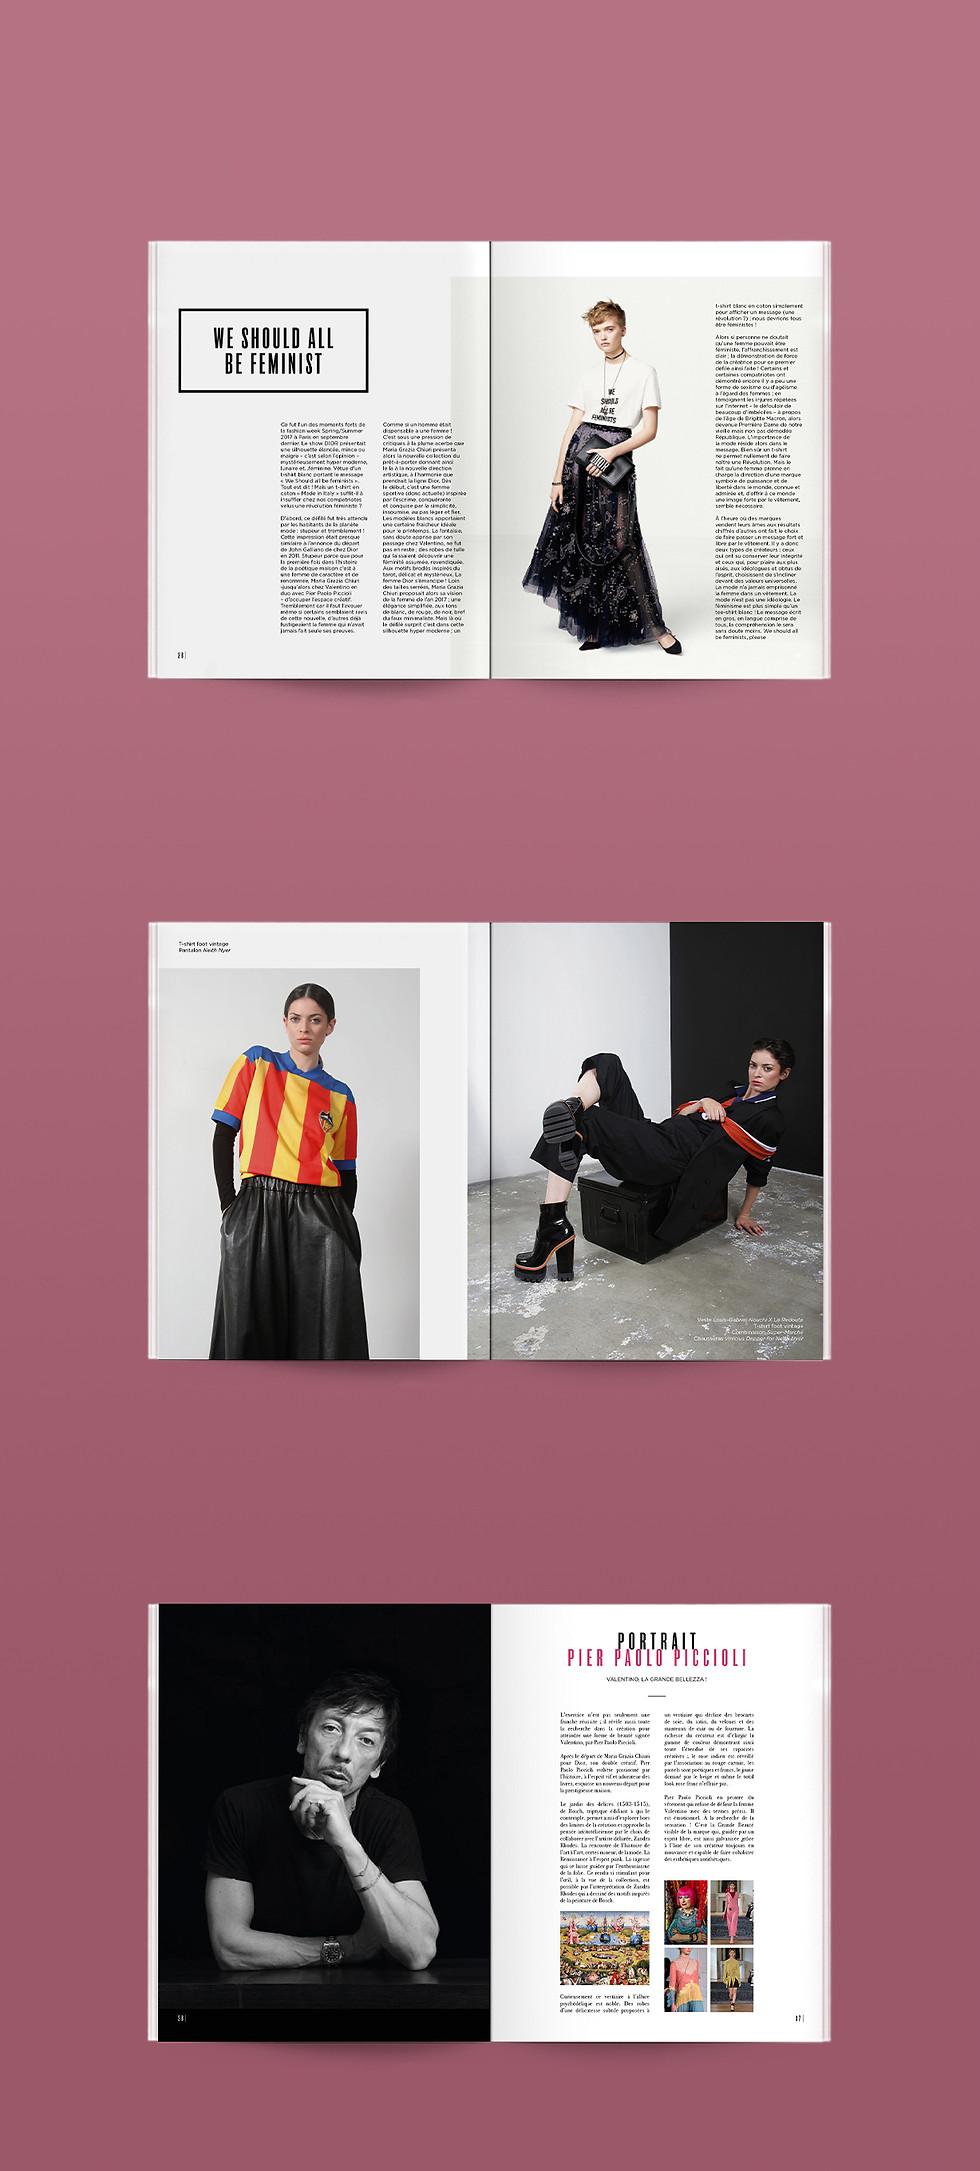 iconicmagazine-edition_1228_150_03.jpg